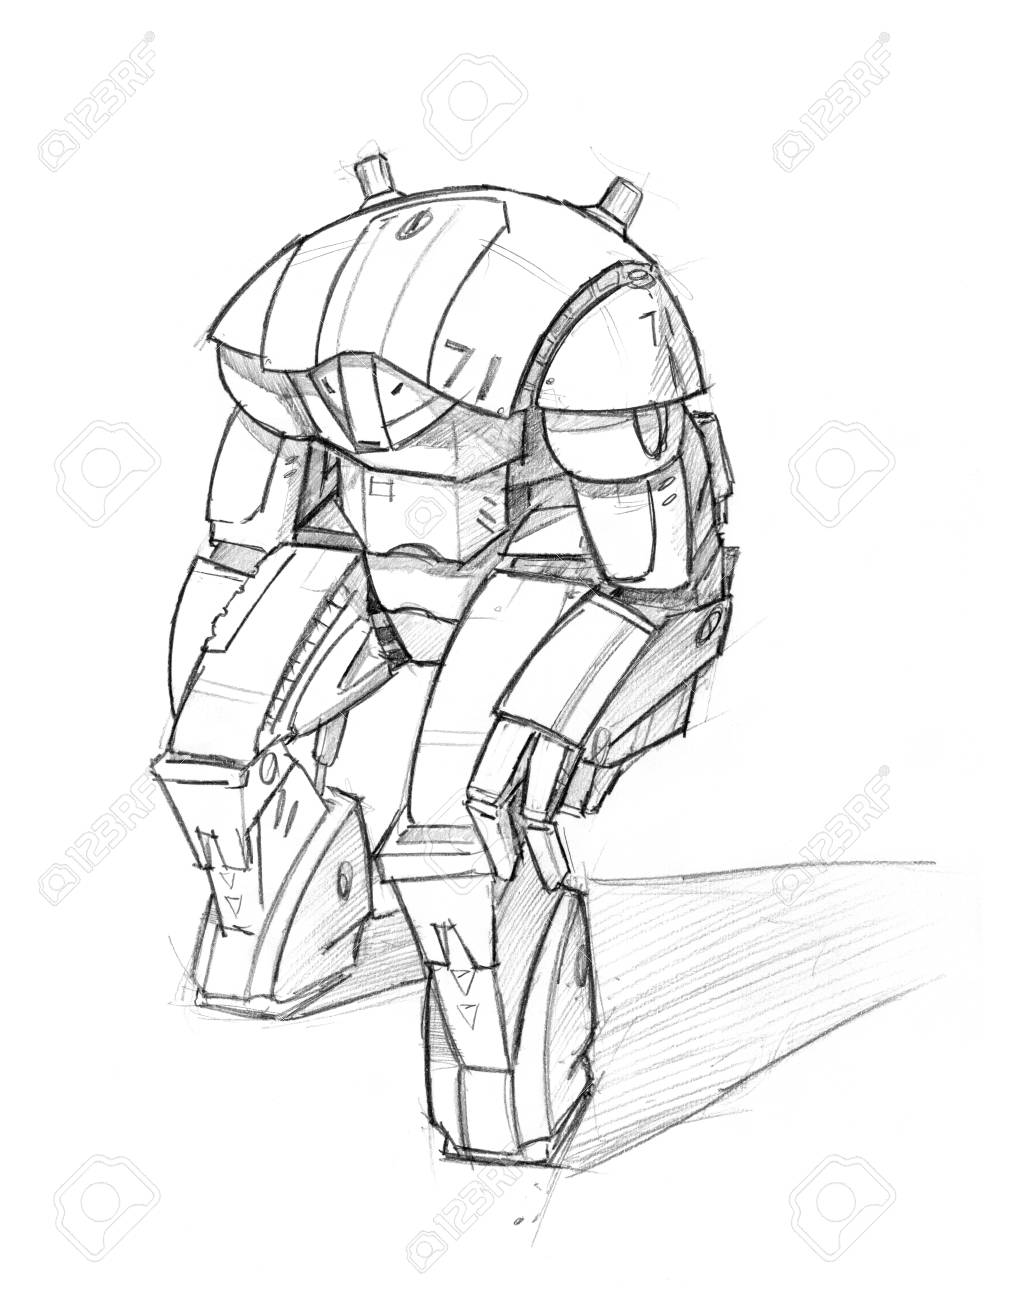 Pencil sketch robot under town